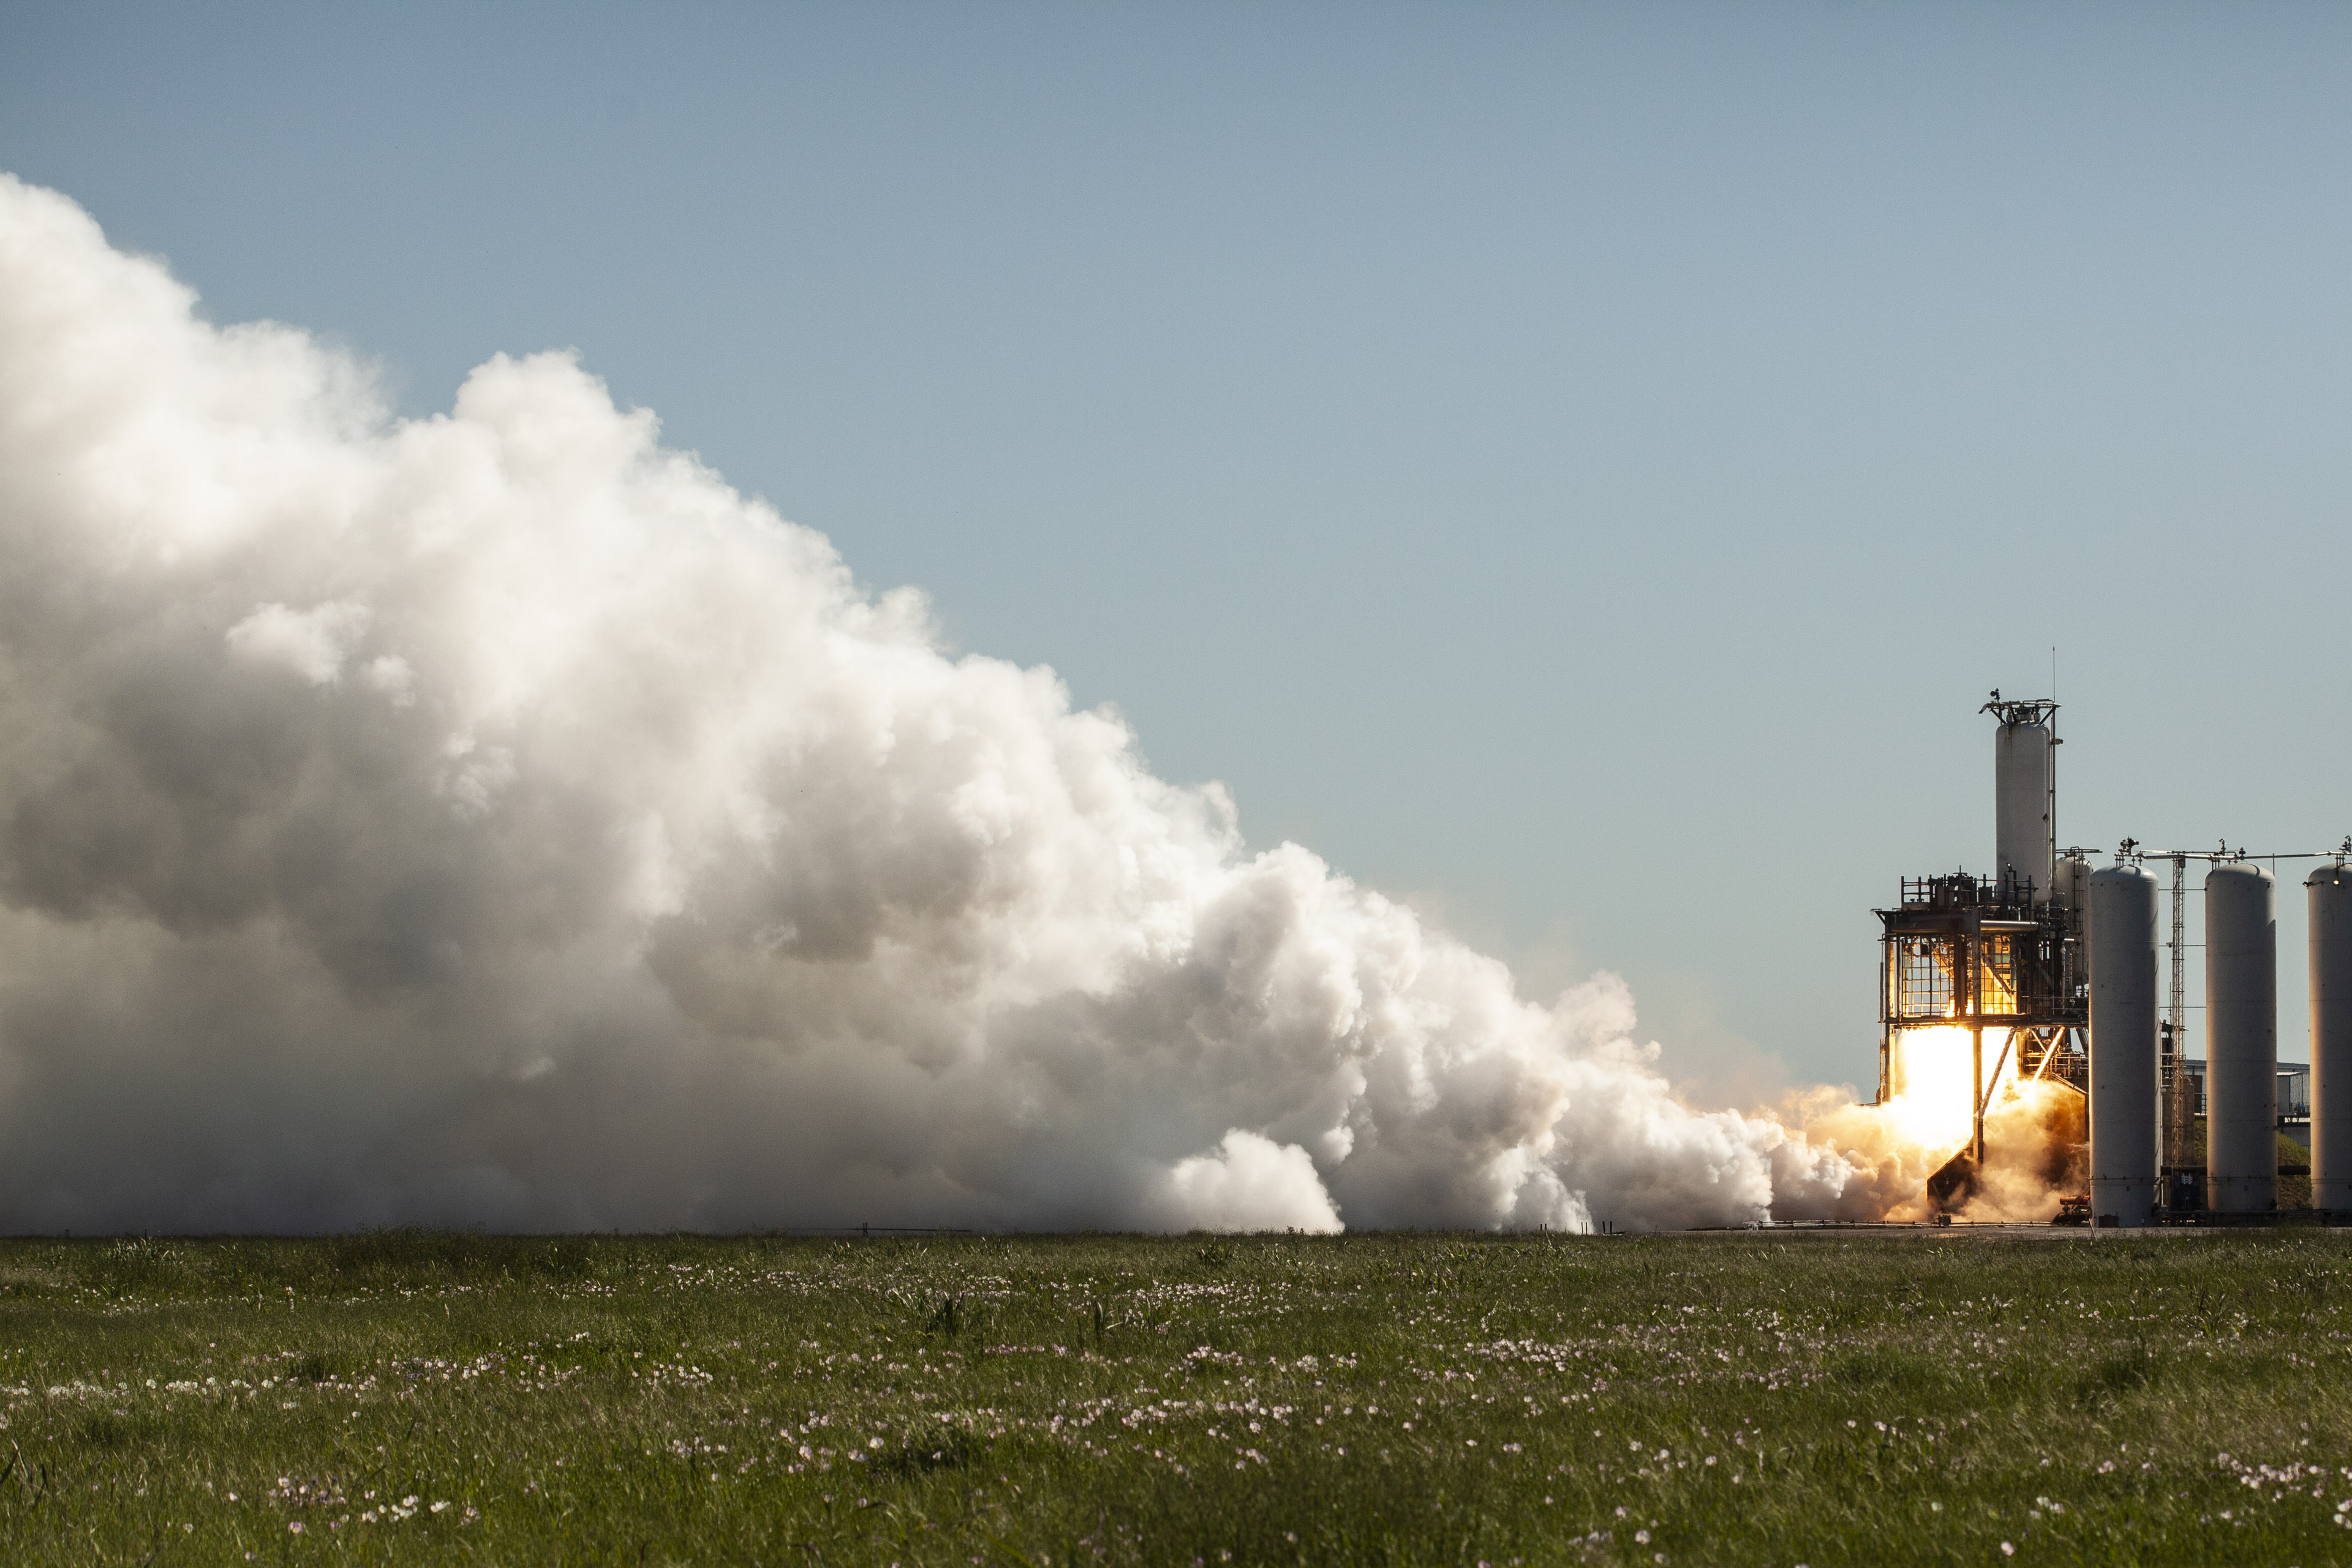 Falcon 9 (Crew Dragon USCV-1) - KSC - 31.10.2020 EWZ_7mjVcAA-huZ?format=jpg&name=4096x4096